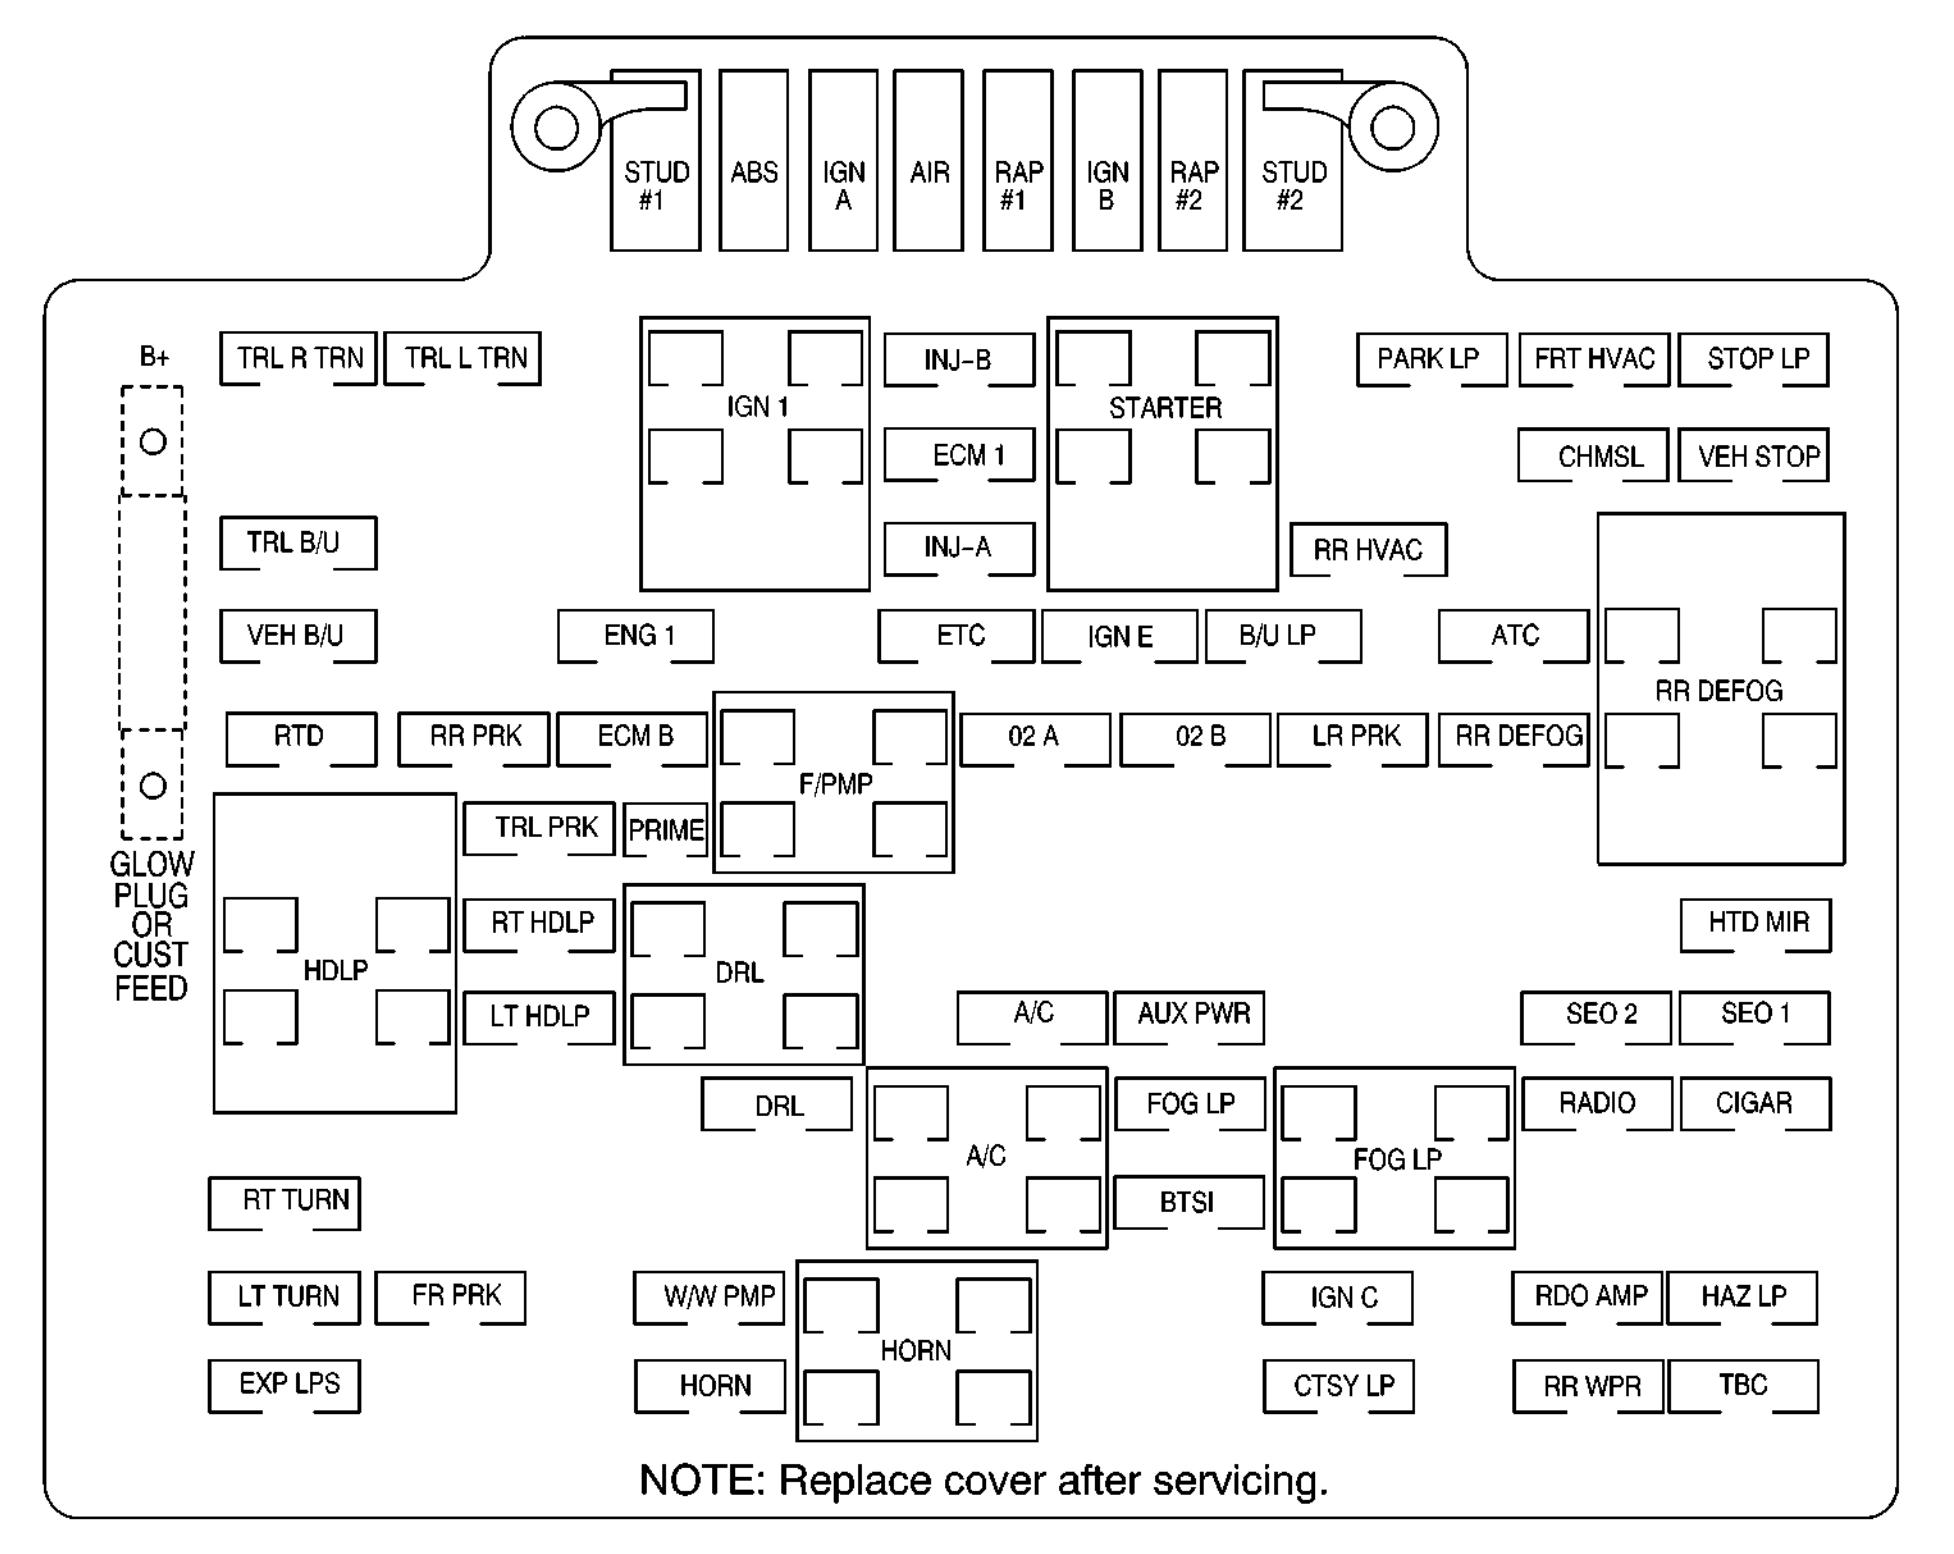 1991 chevrolet suburban fuse box wiring diagram best wiring library rh 182 princestaash org